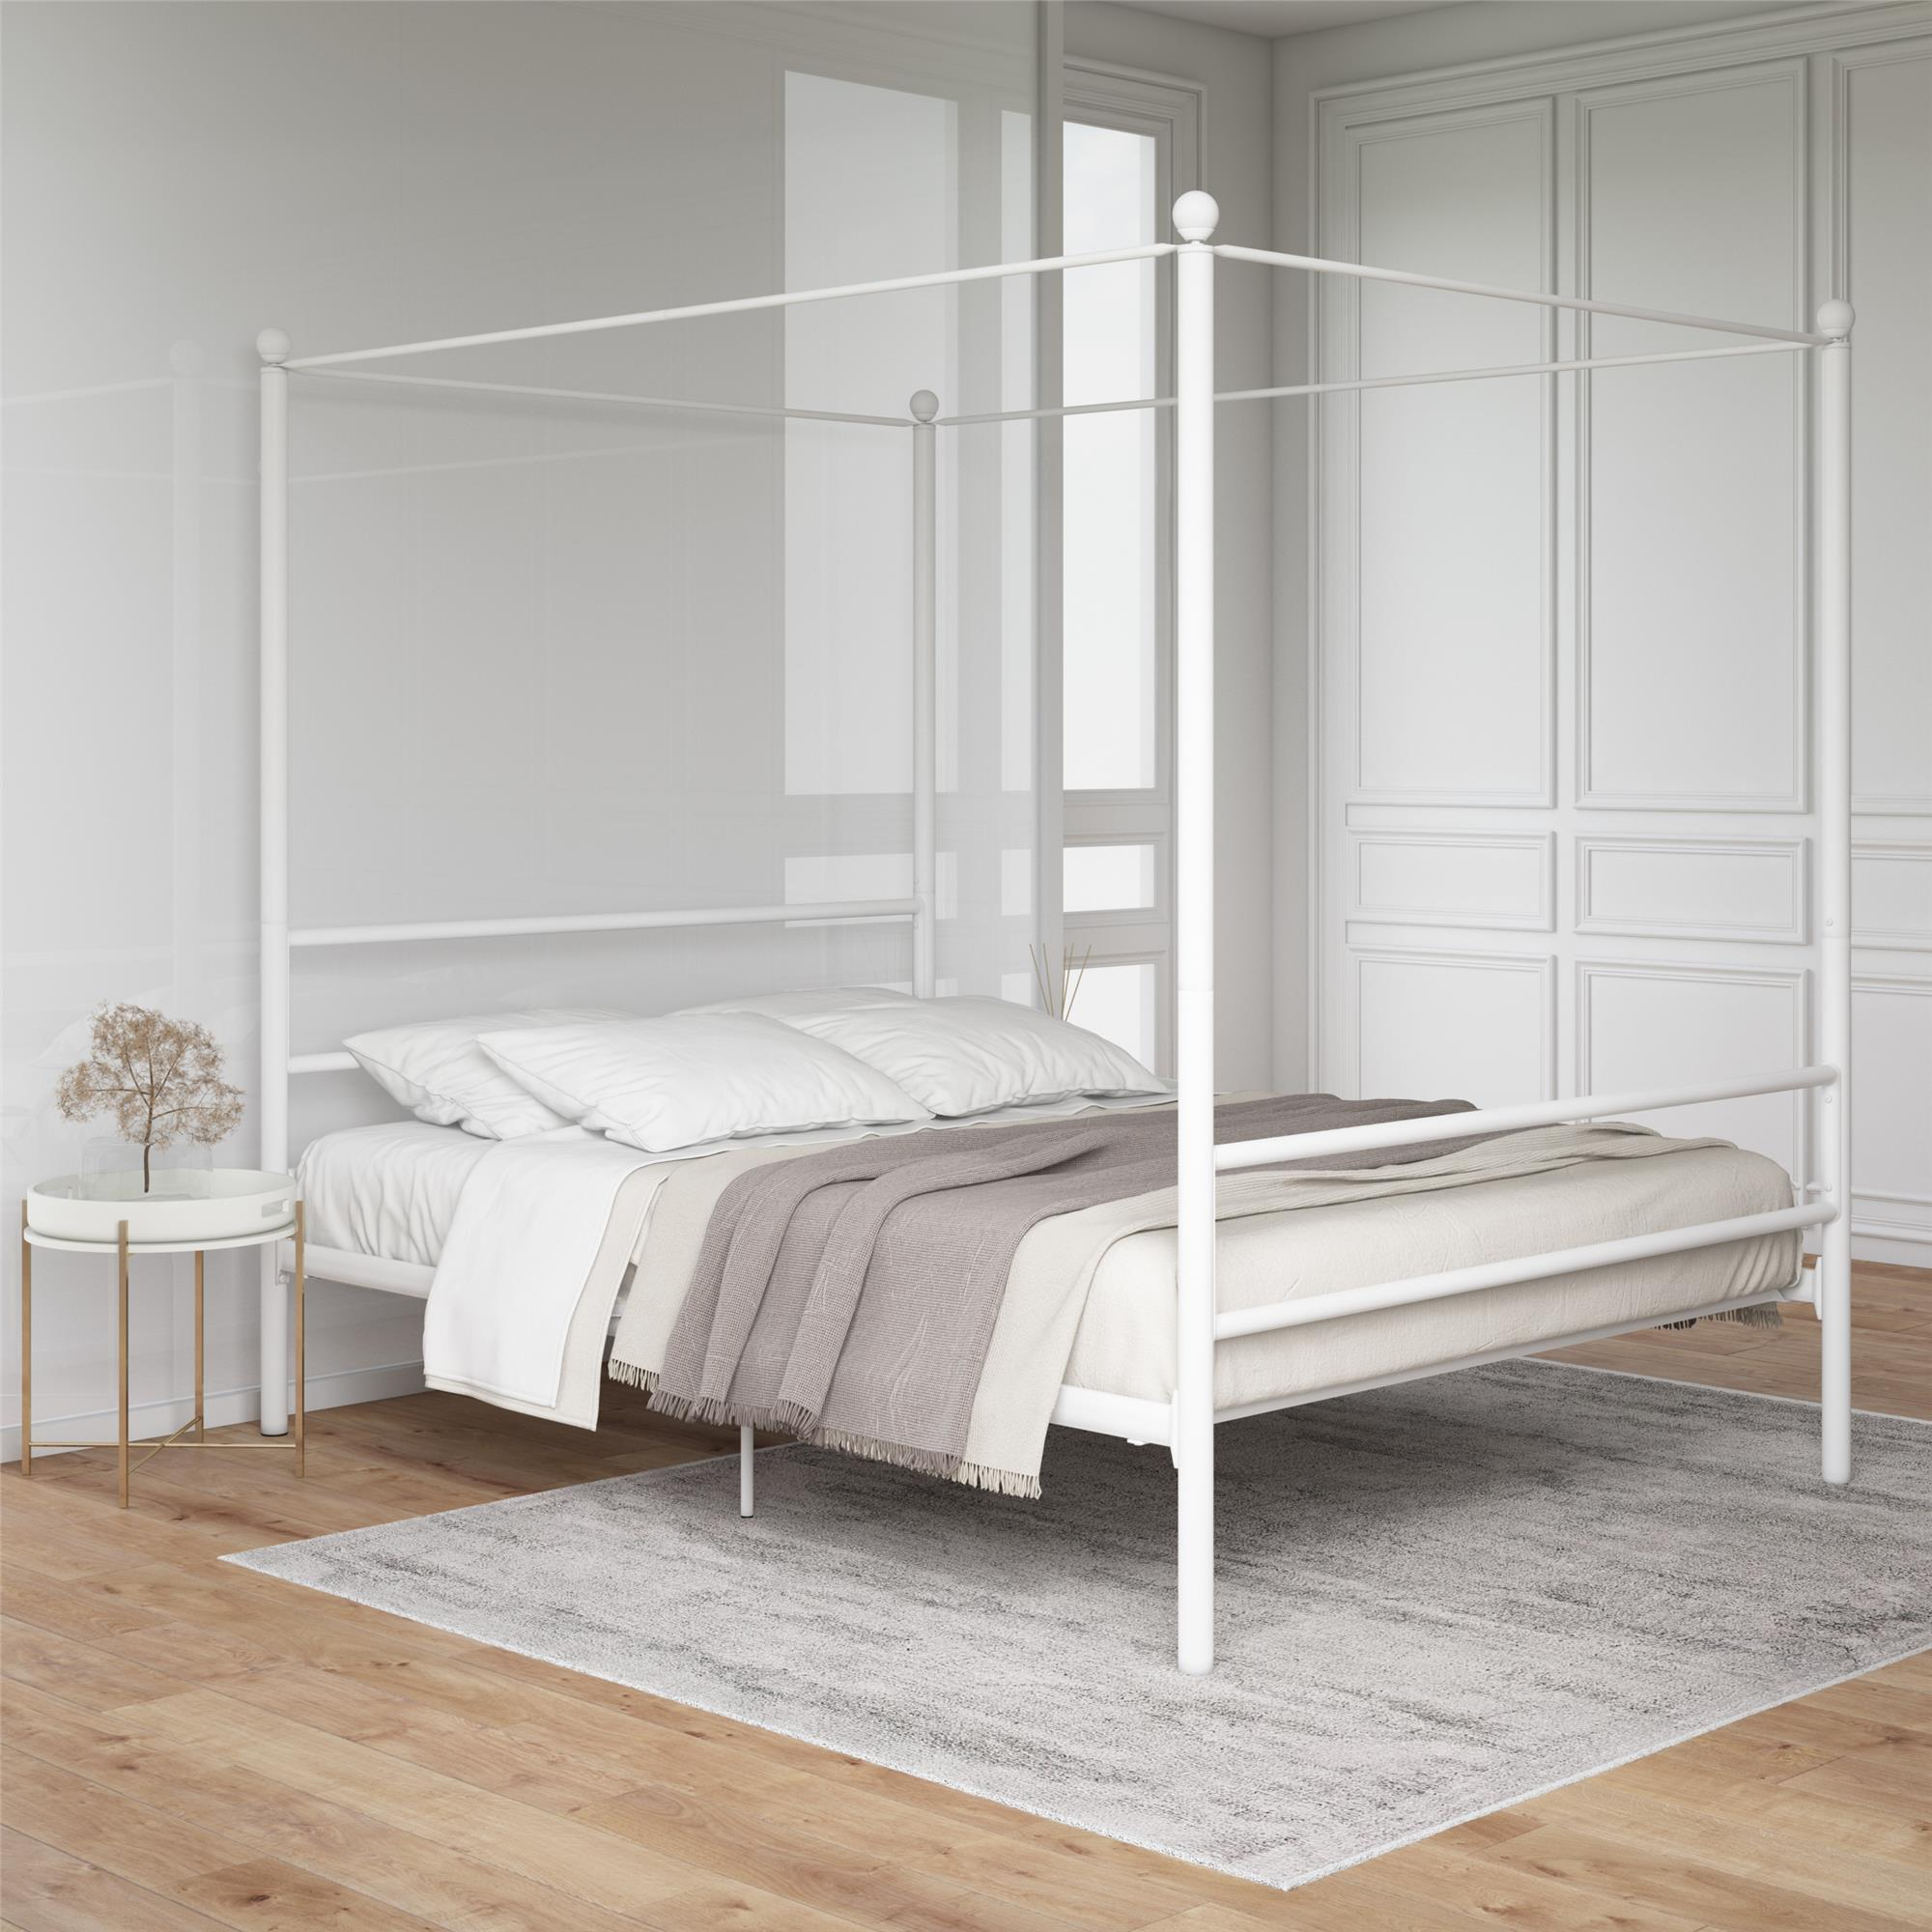 Mainstays Metal Canopy Bed White Queen Walmart Com Walmart Com